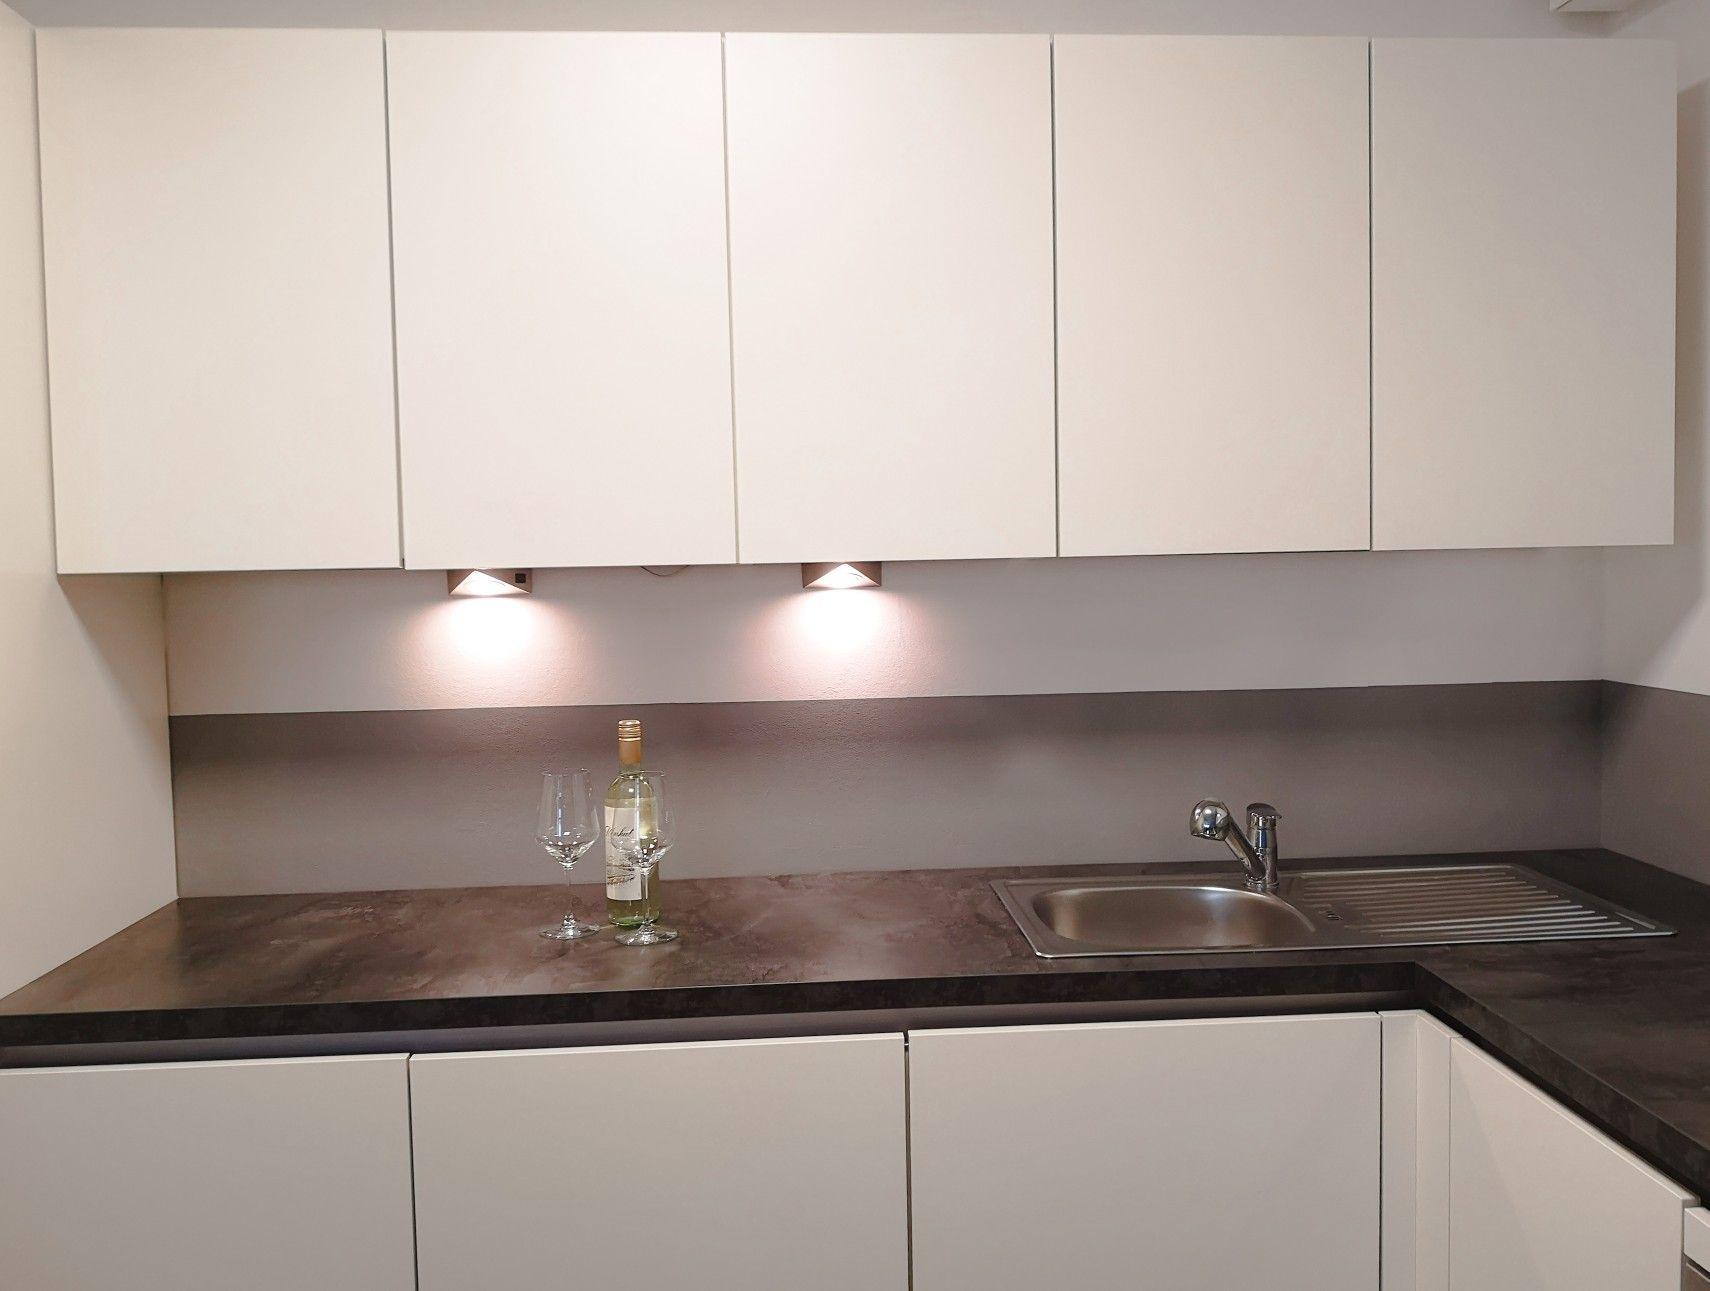 Küchenrückwand  Küchenrückwand, Küche, Latexfarbe